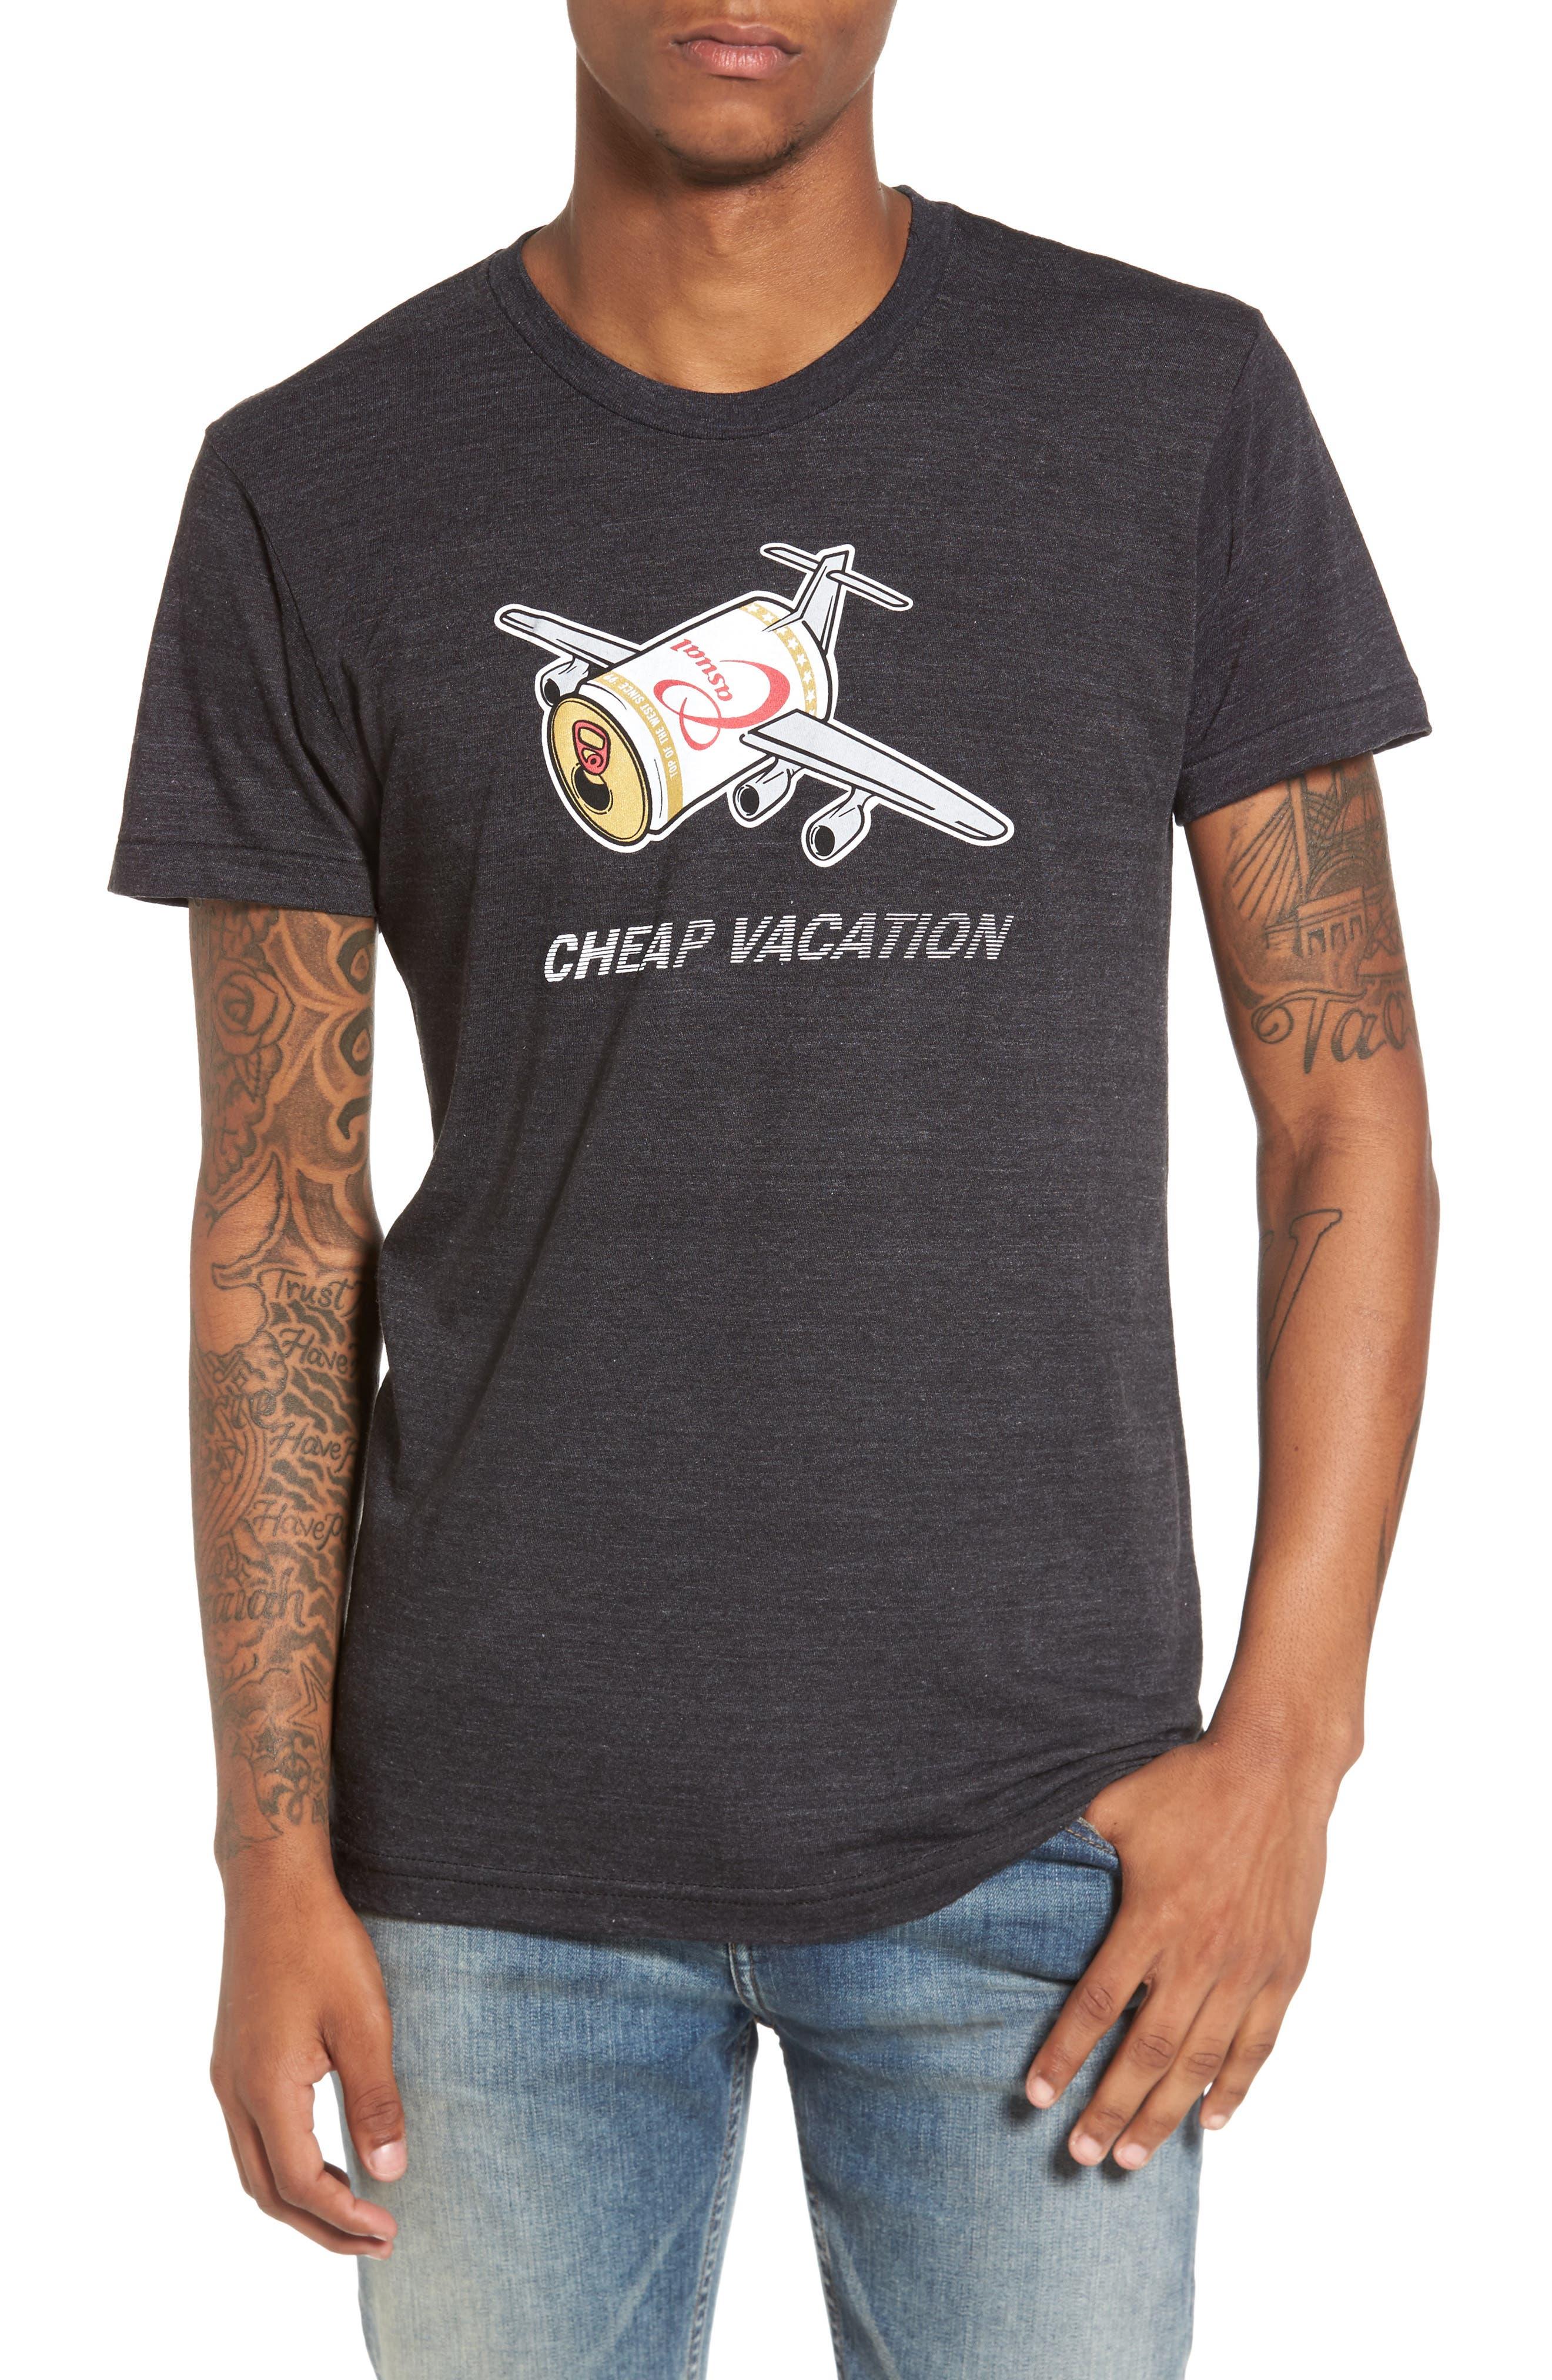 Main Image - Casual Industrees Cheap Vacation T-Shirt